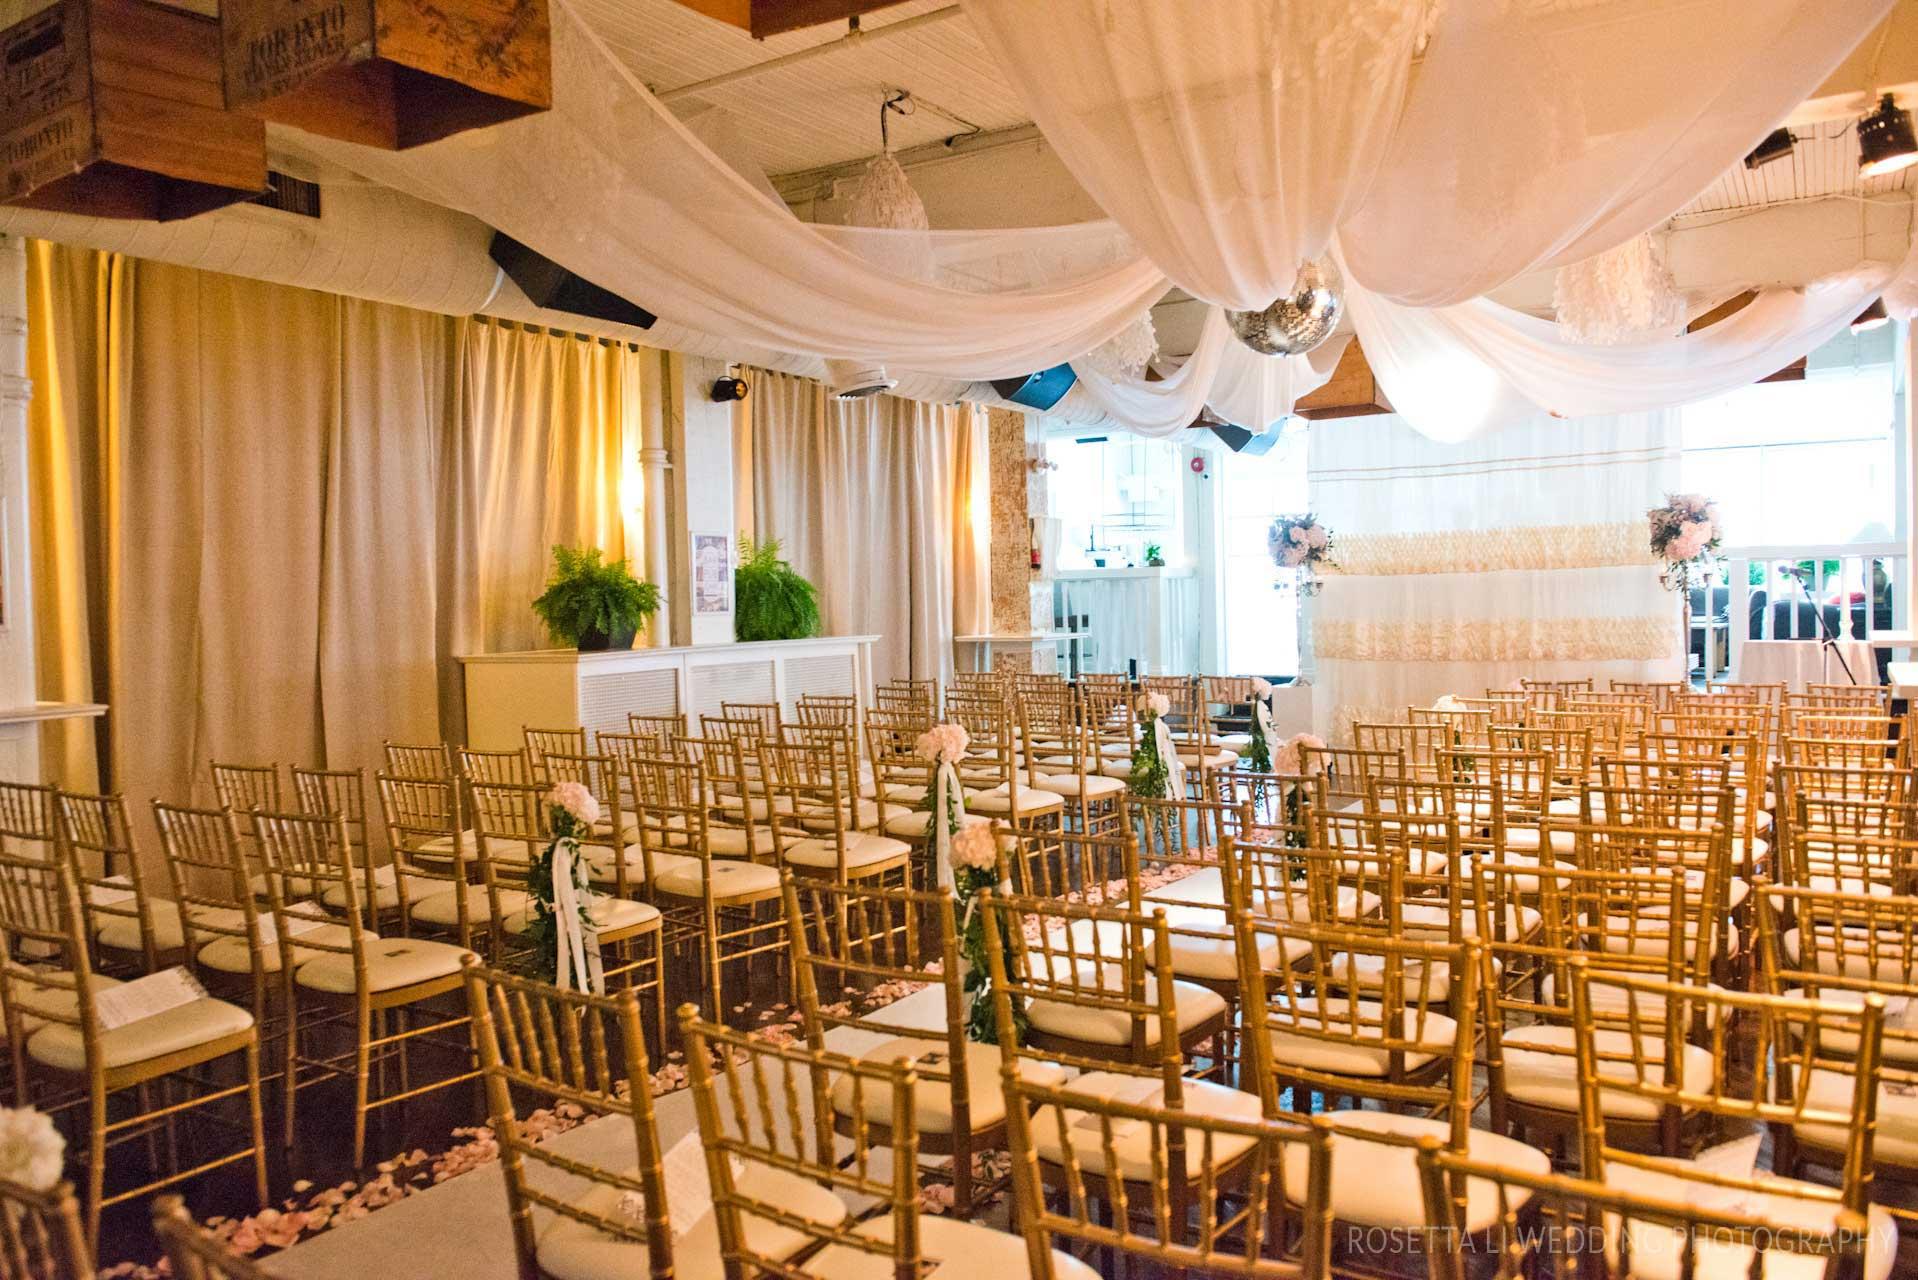 Wedding Venues Toronto - Wedding Ceremony in an Urban Loft